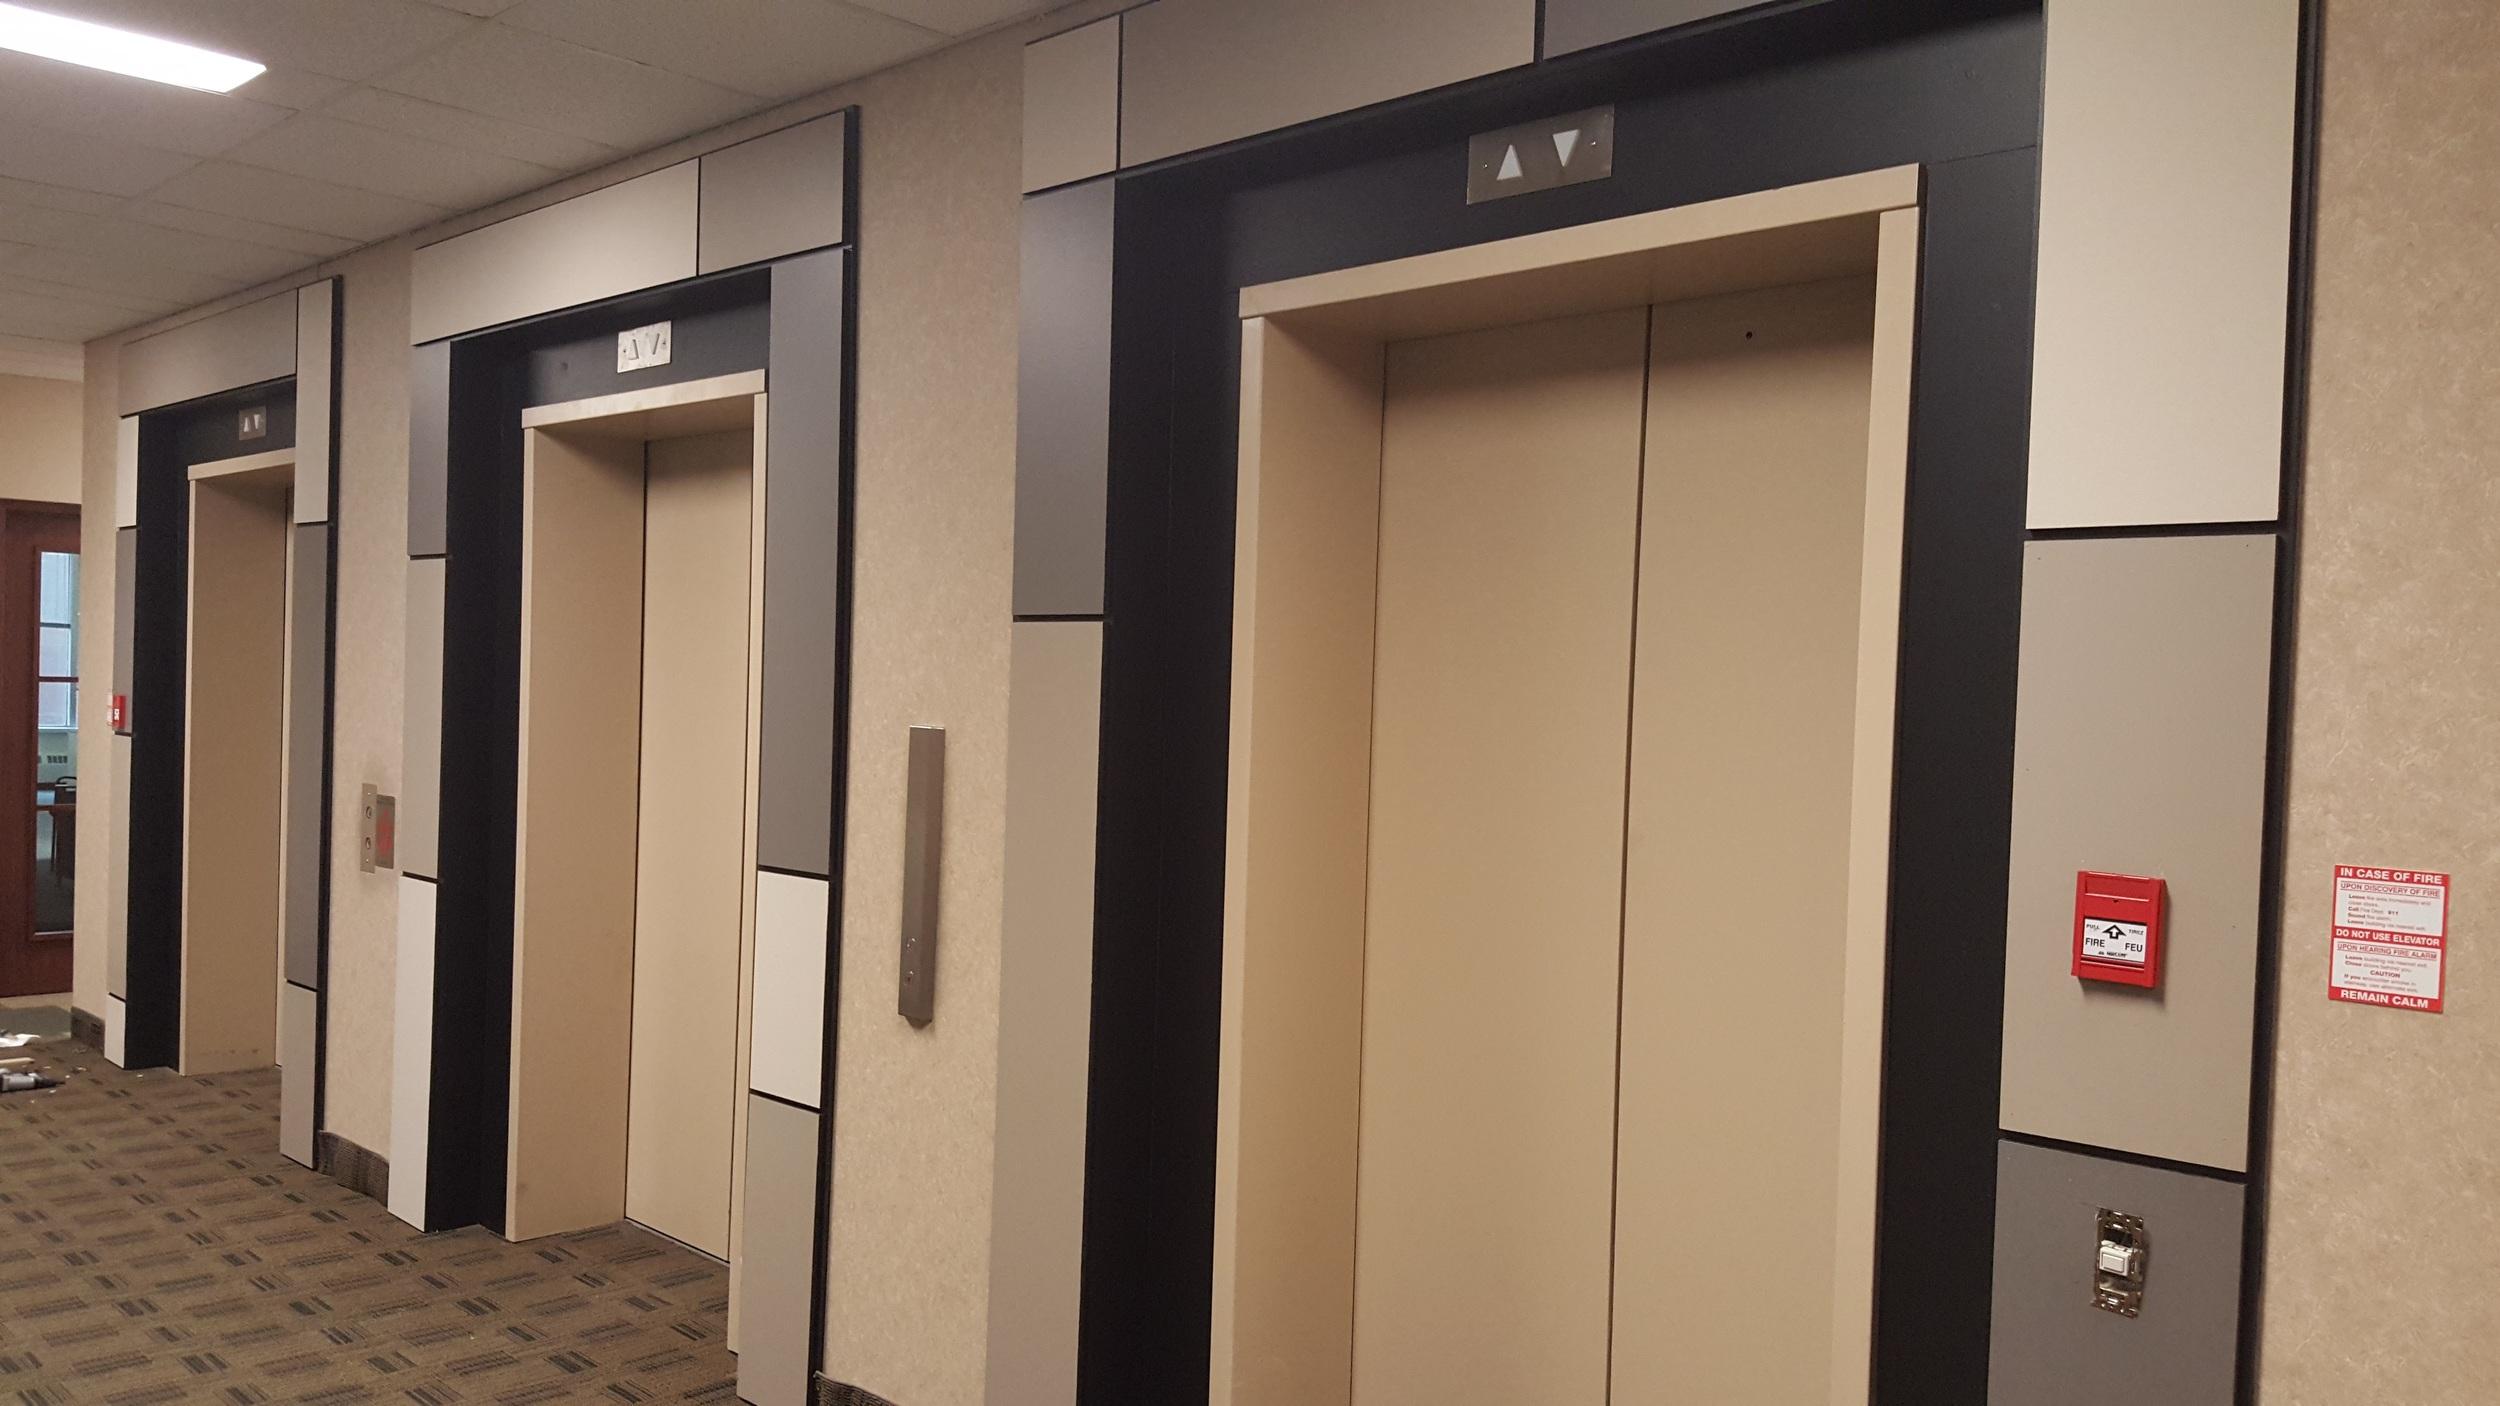 Elevator Surrounds